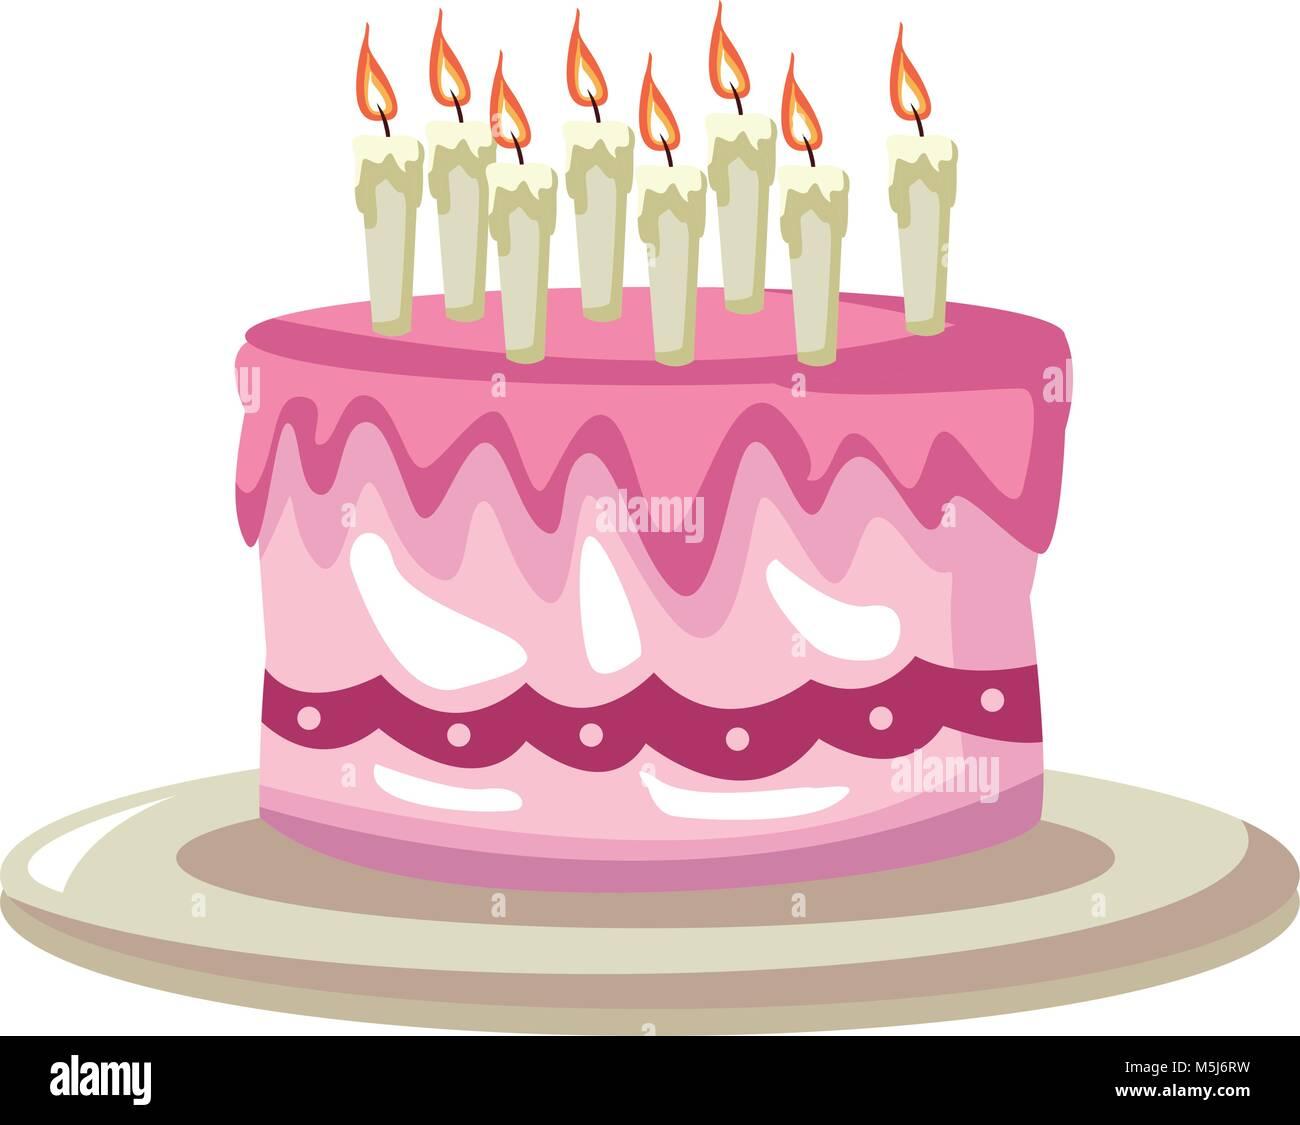 Birthday Cake Cartoon Stock Vector Art Illustration Image